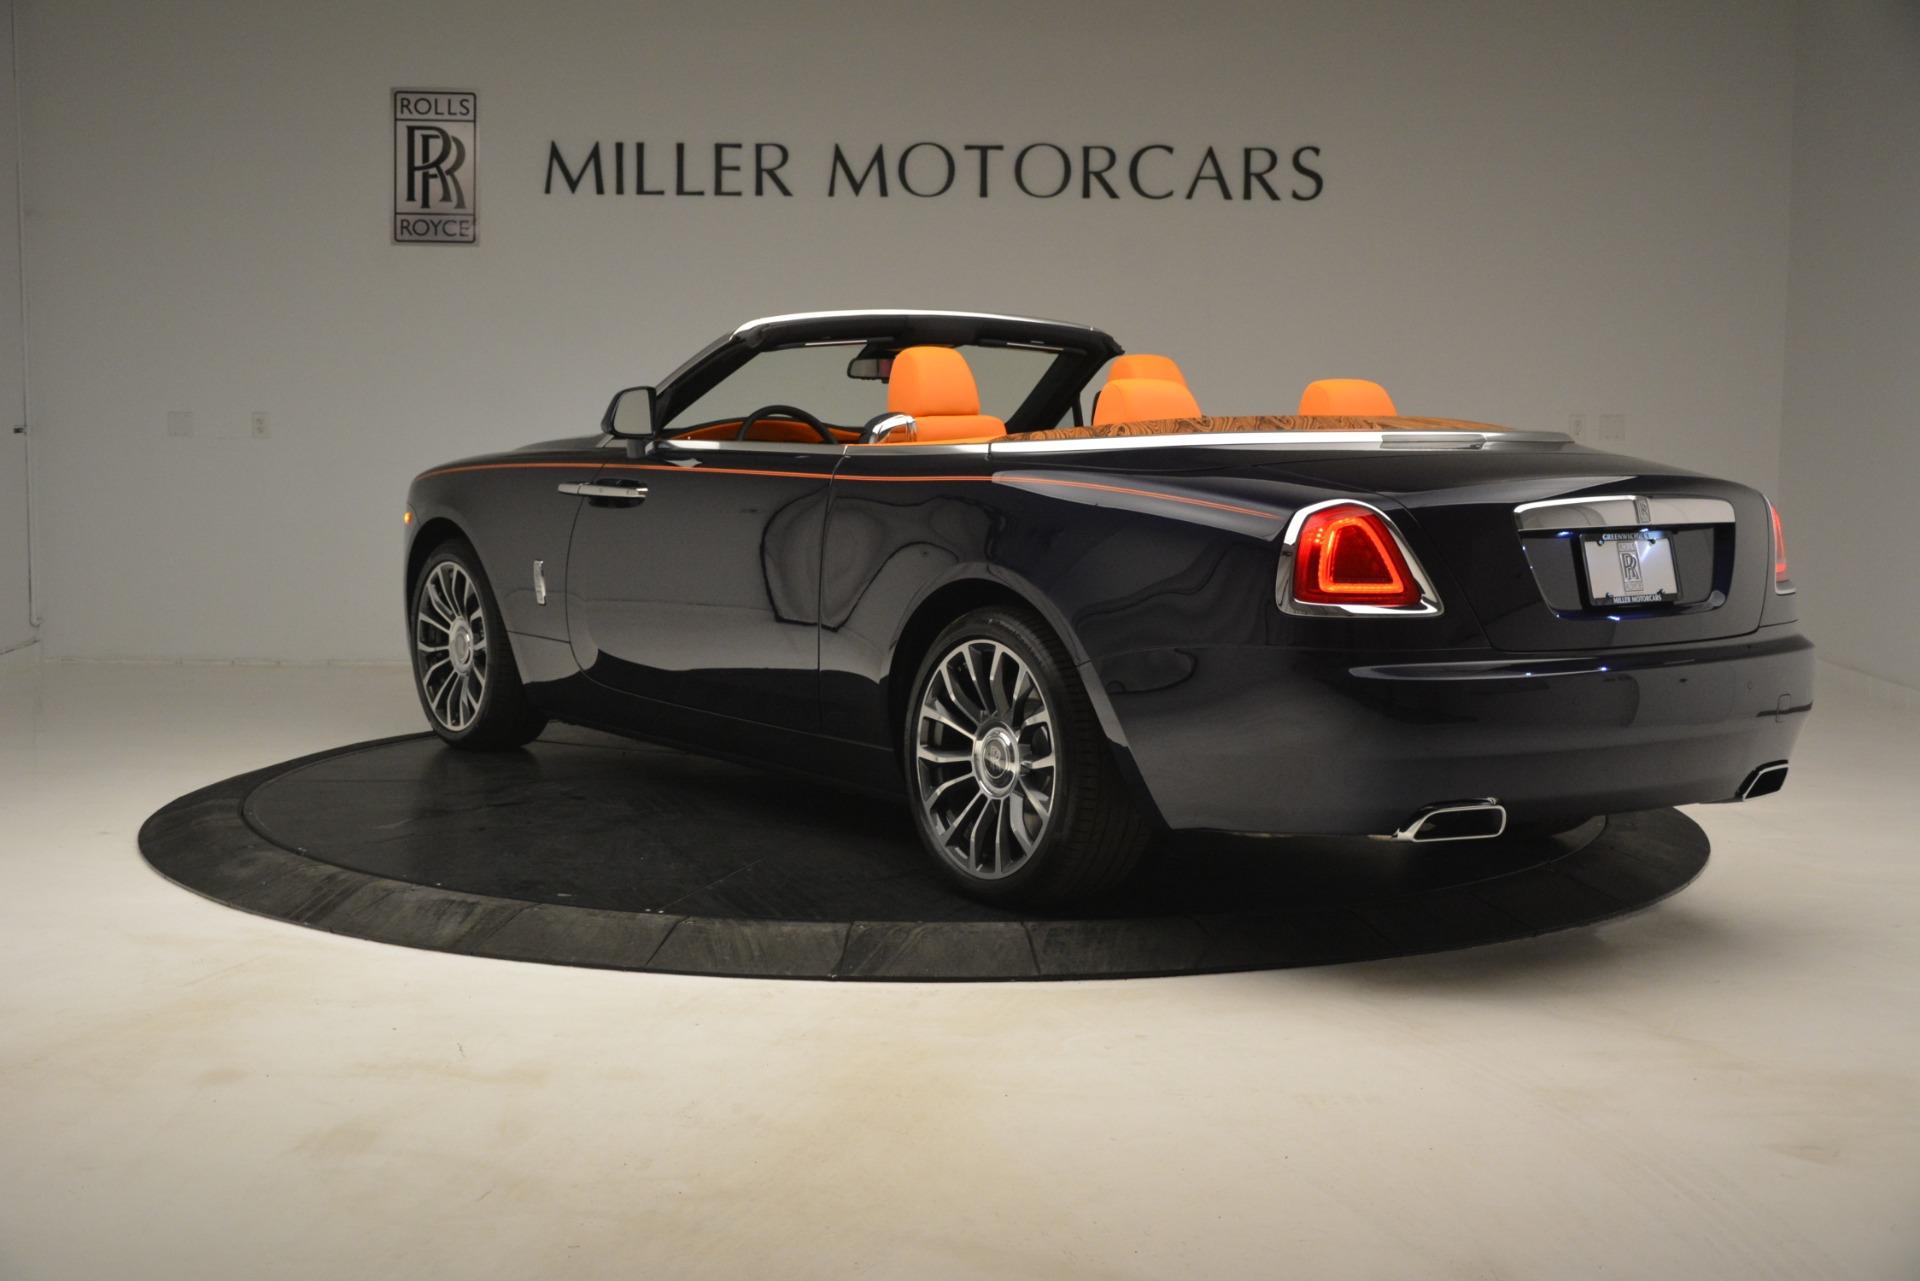 New 2019 Rolls-Royce Dawn  For Sale In Greenwich, CT 2701_p6